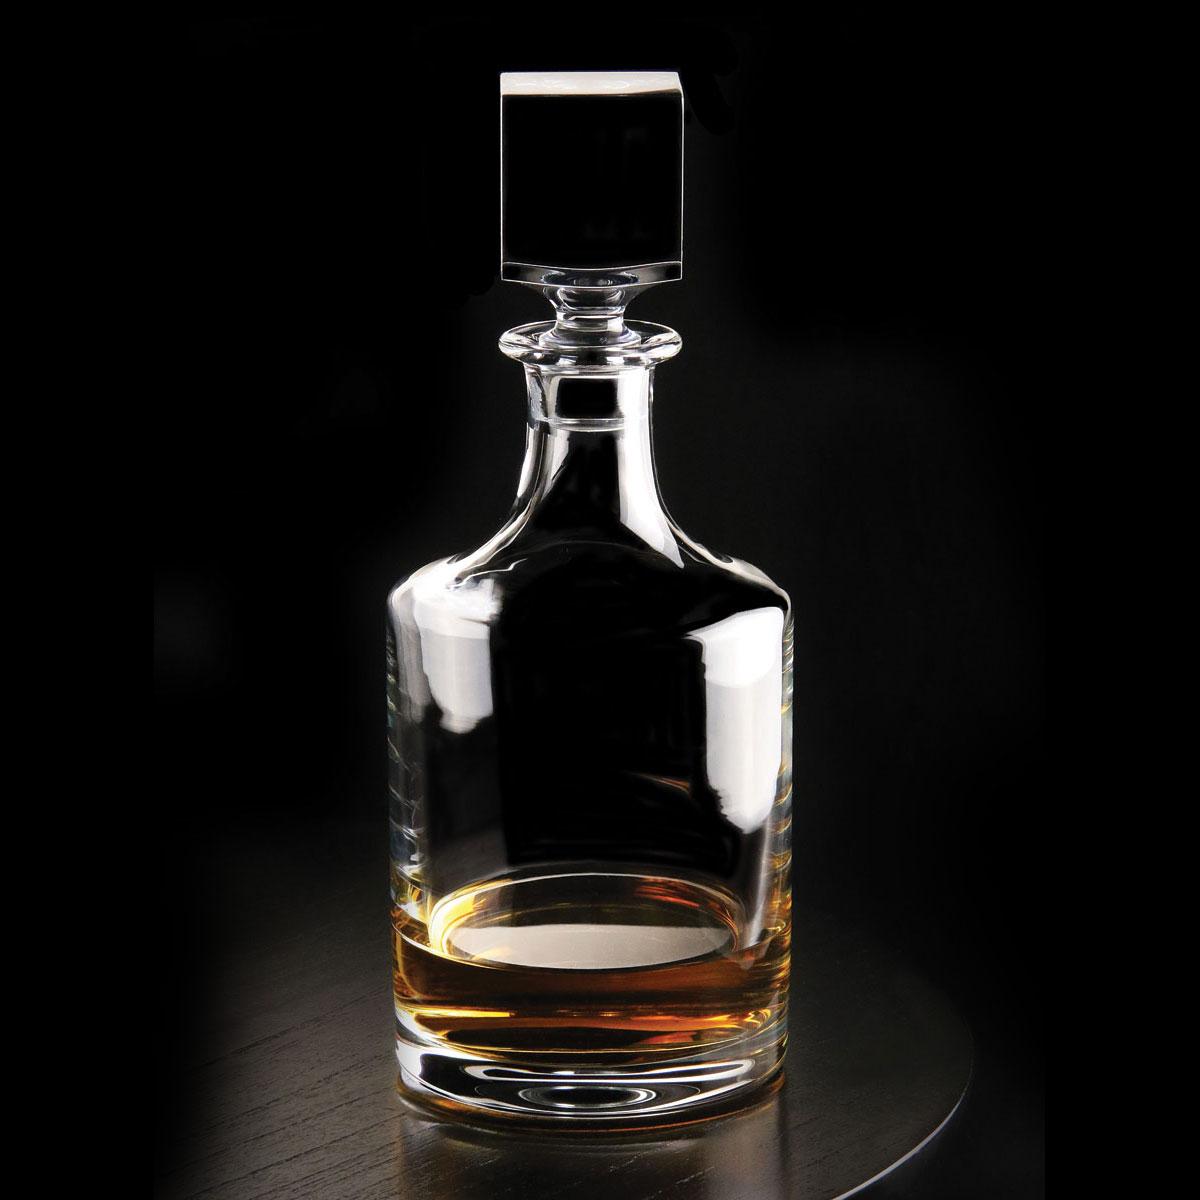 Cashs Ireland, Grand Cru Handmade Crystal Whiskey Decanter